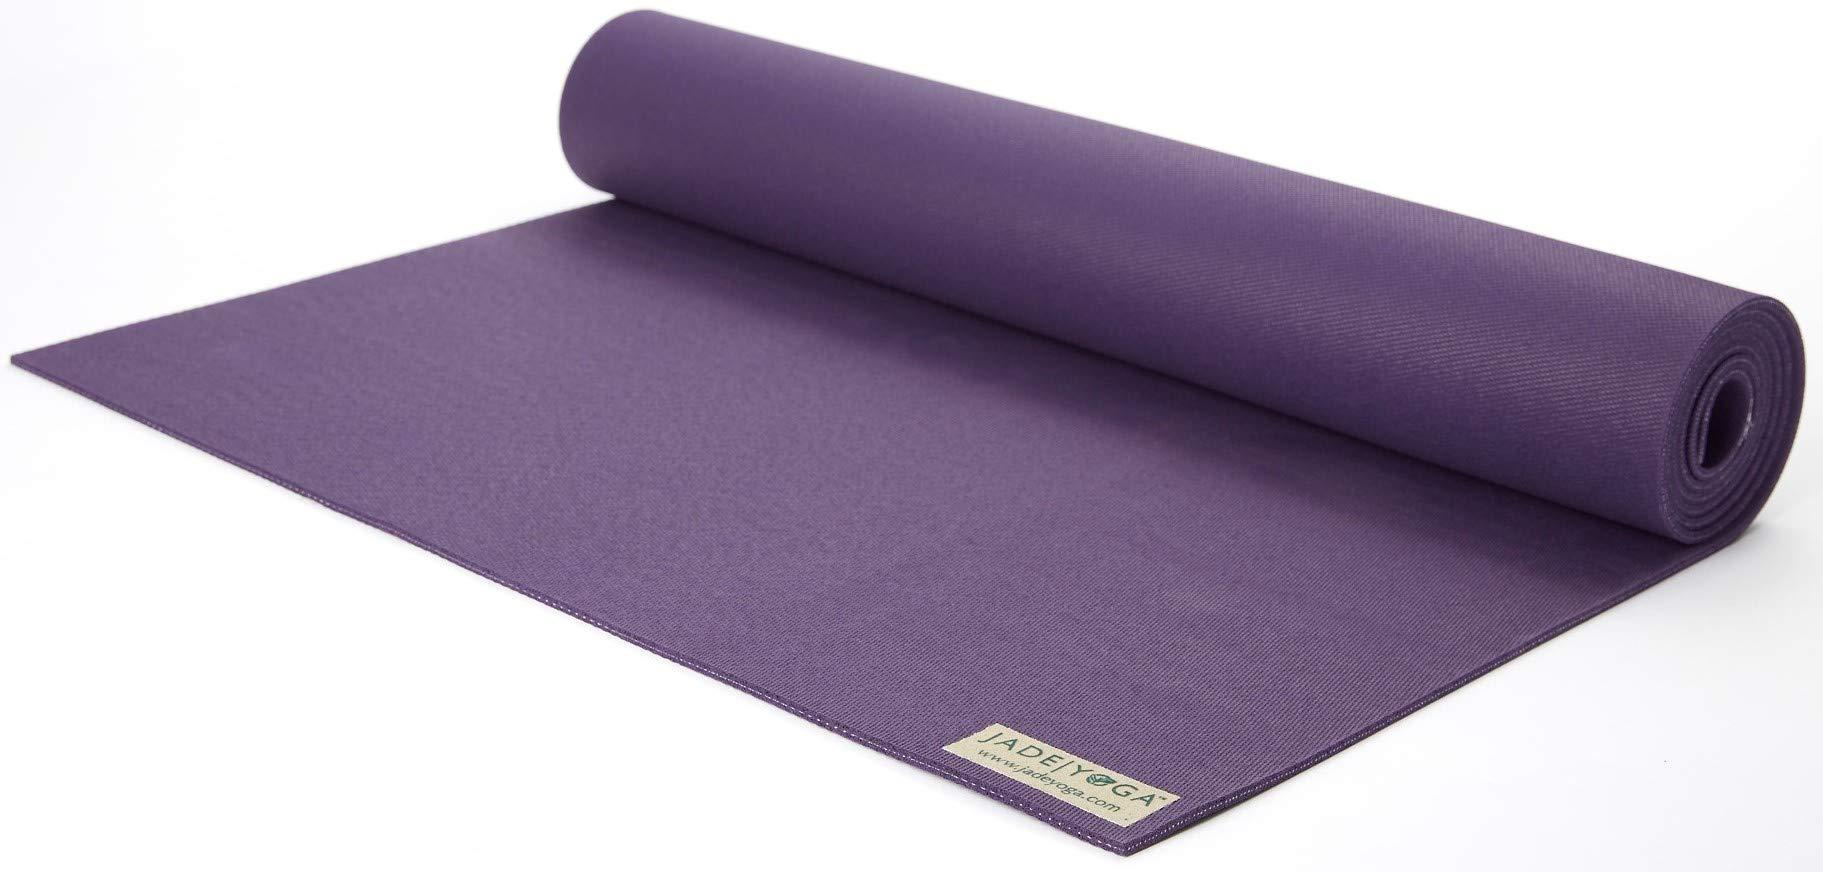 Jade 68-Inch by 1/8-Inch Travel Yoga Mat (Purple)